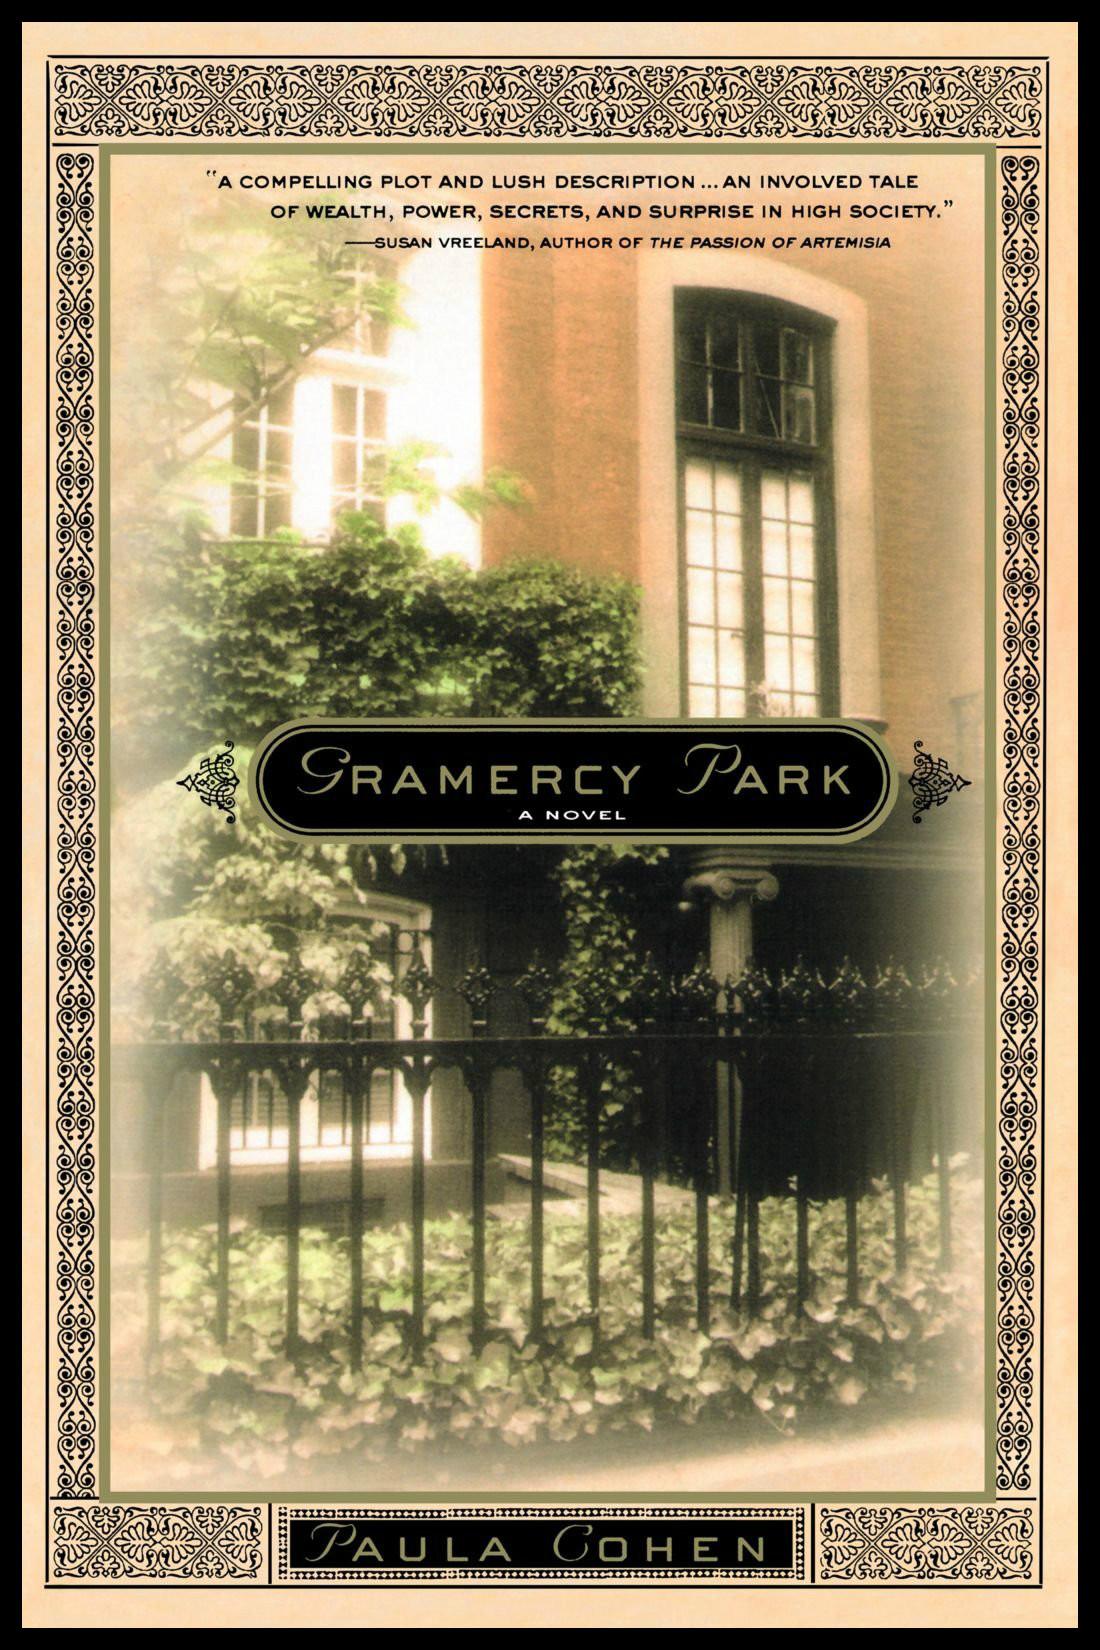 Gramercy_park